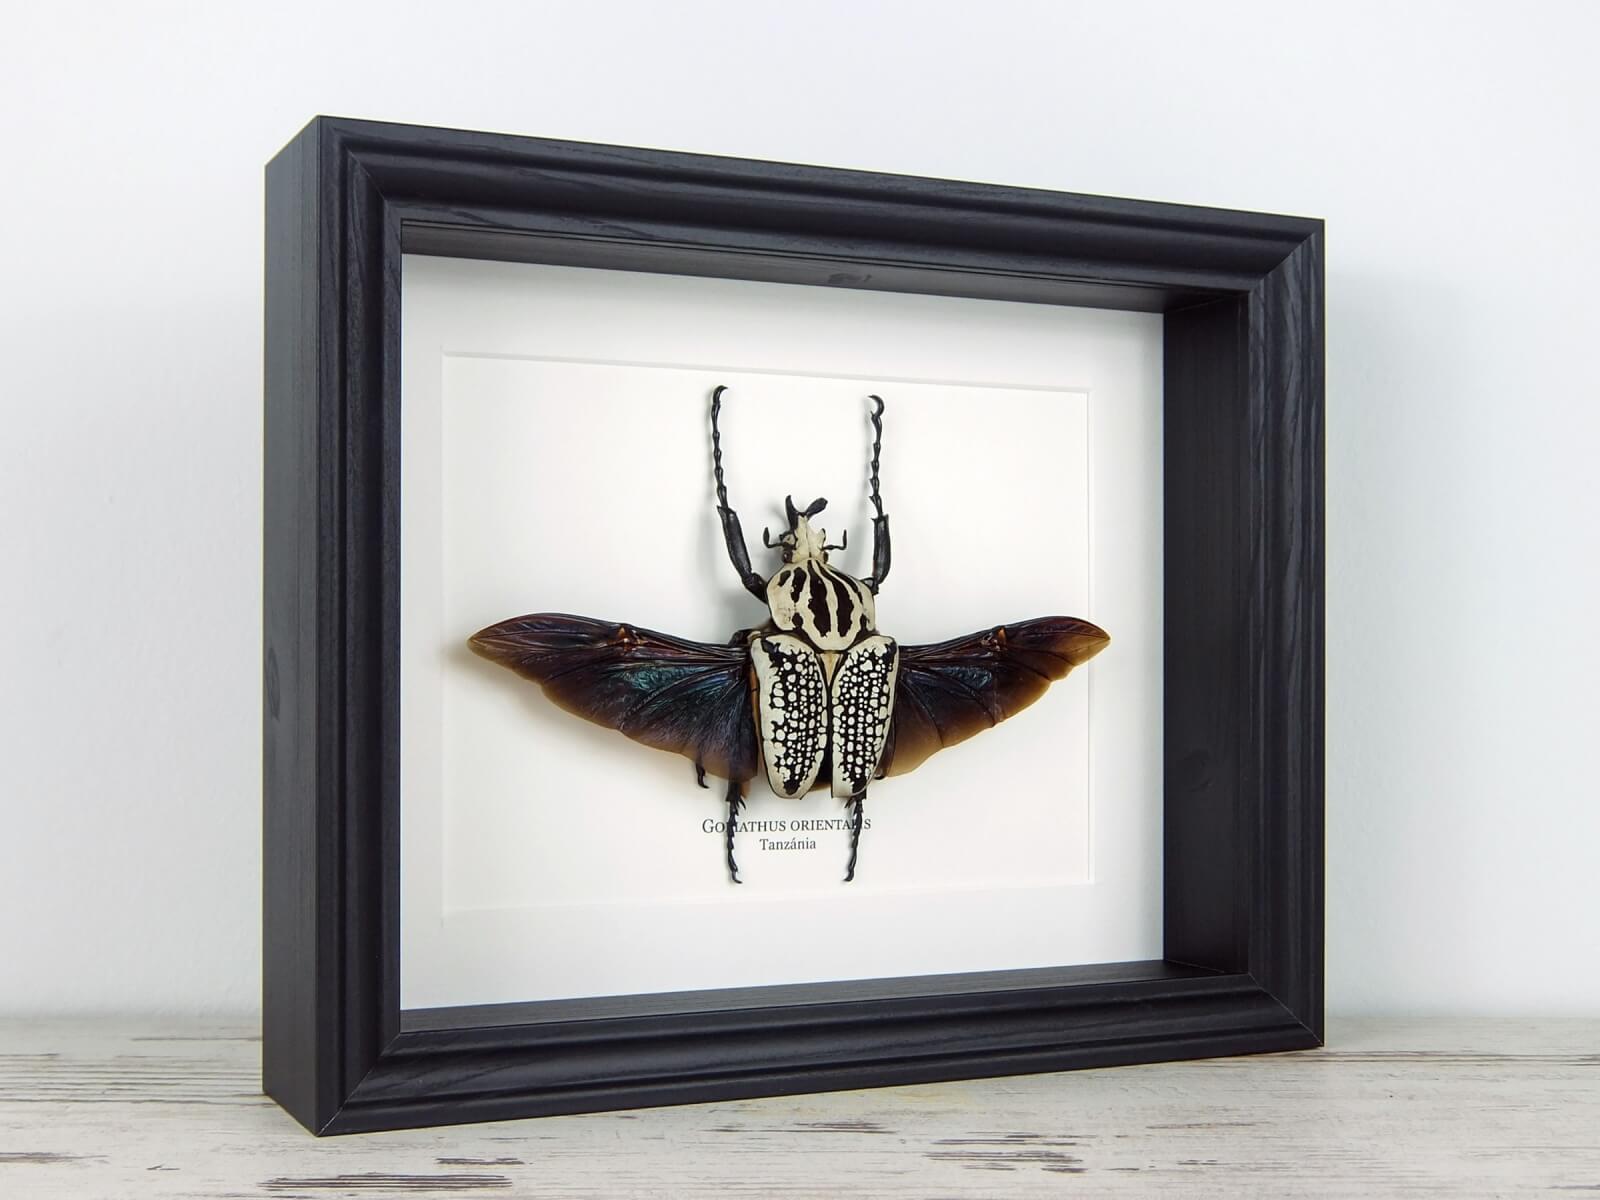 Goliathus orientalis, fekete keretben | #2214